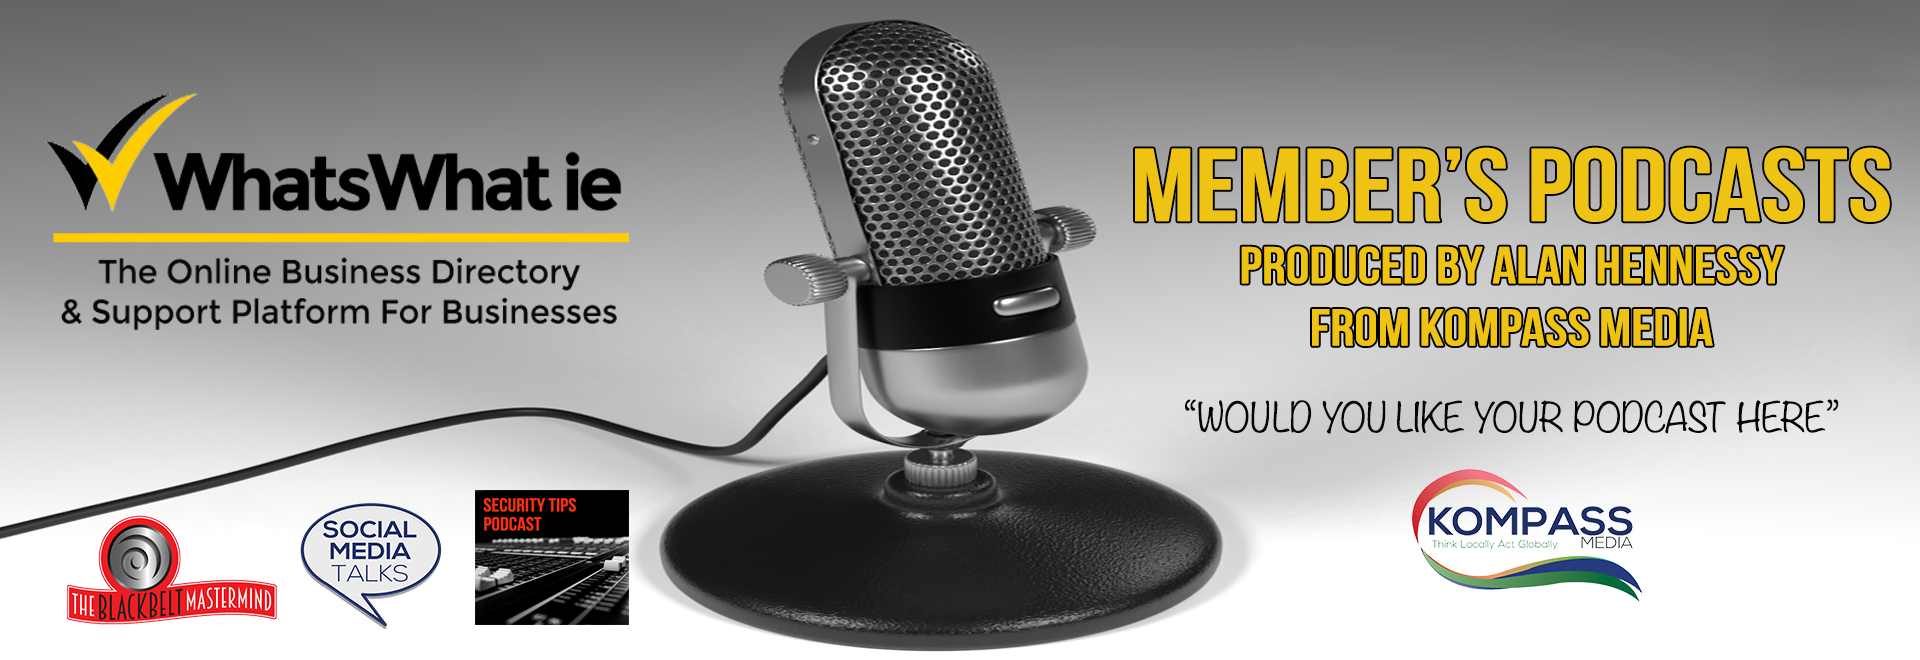 Podcasts by Kompass media